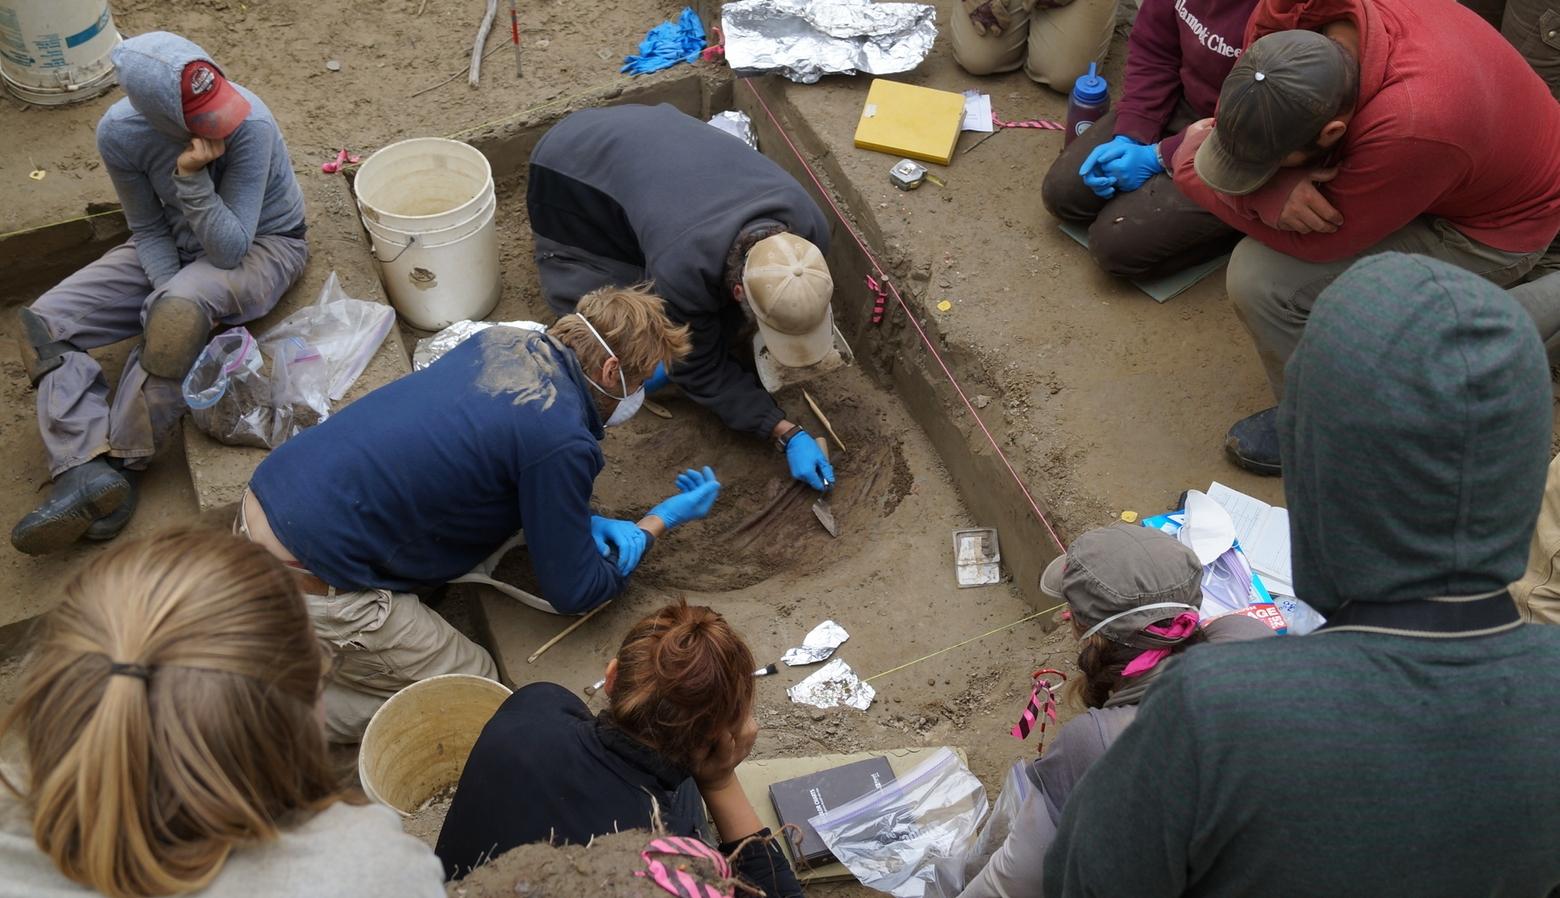 Image courtesy of Ben Potter, UAF Researchers work on excavation at the Upward Sun River site in Alaska.